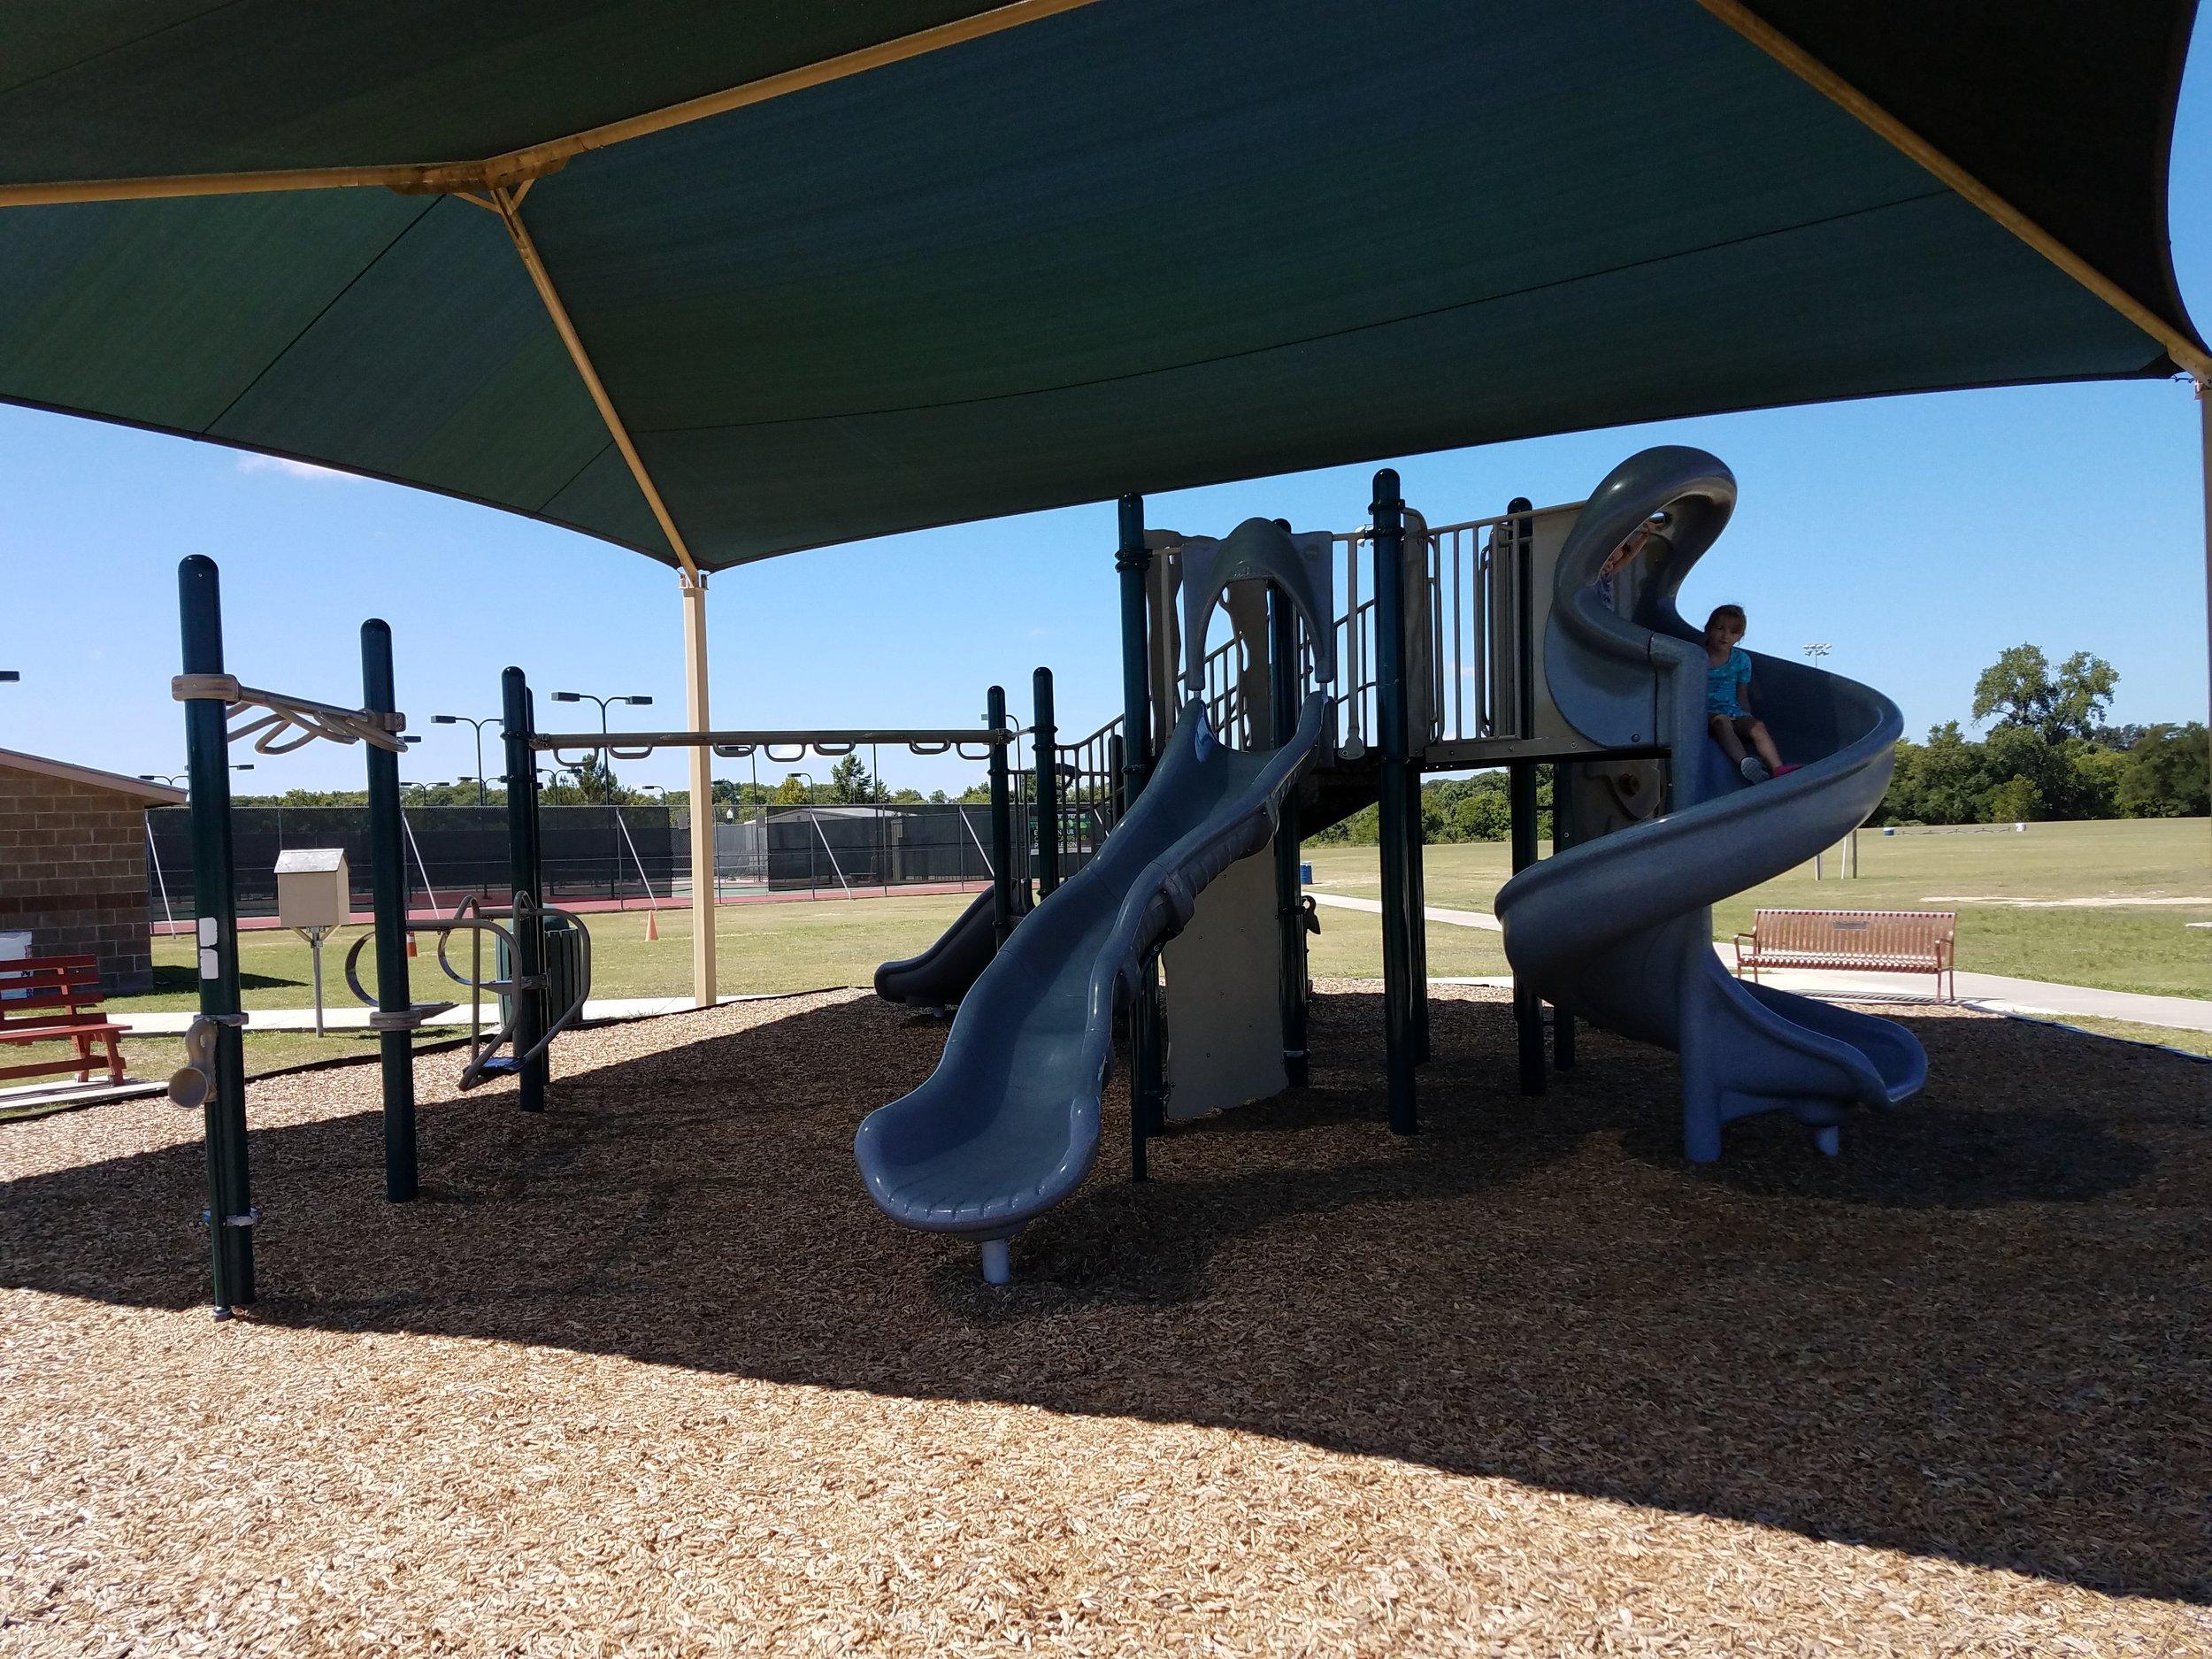 Boerne City Park